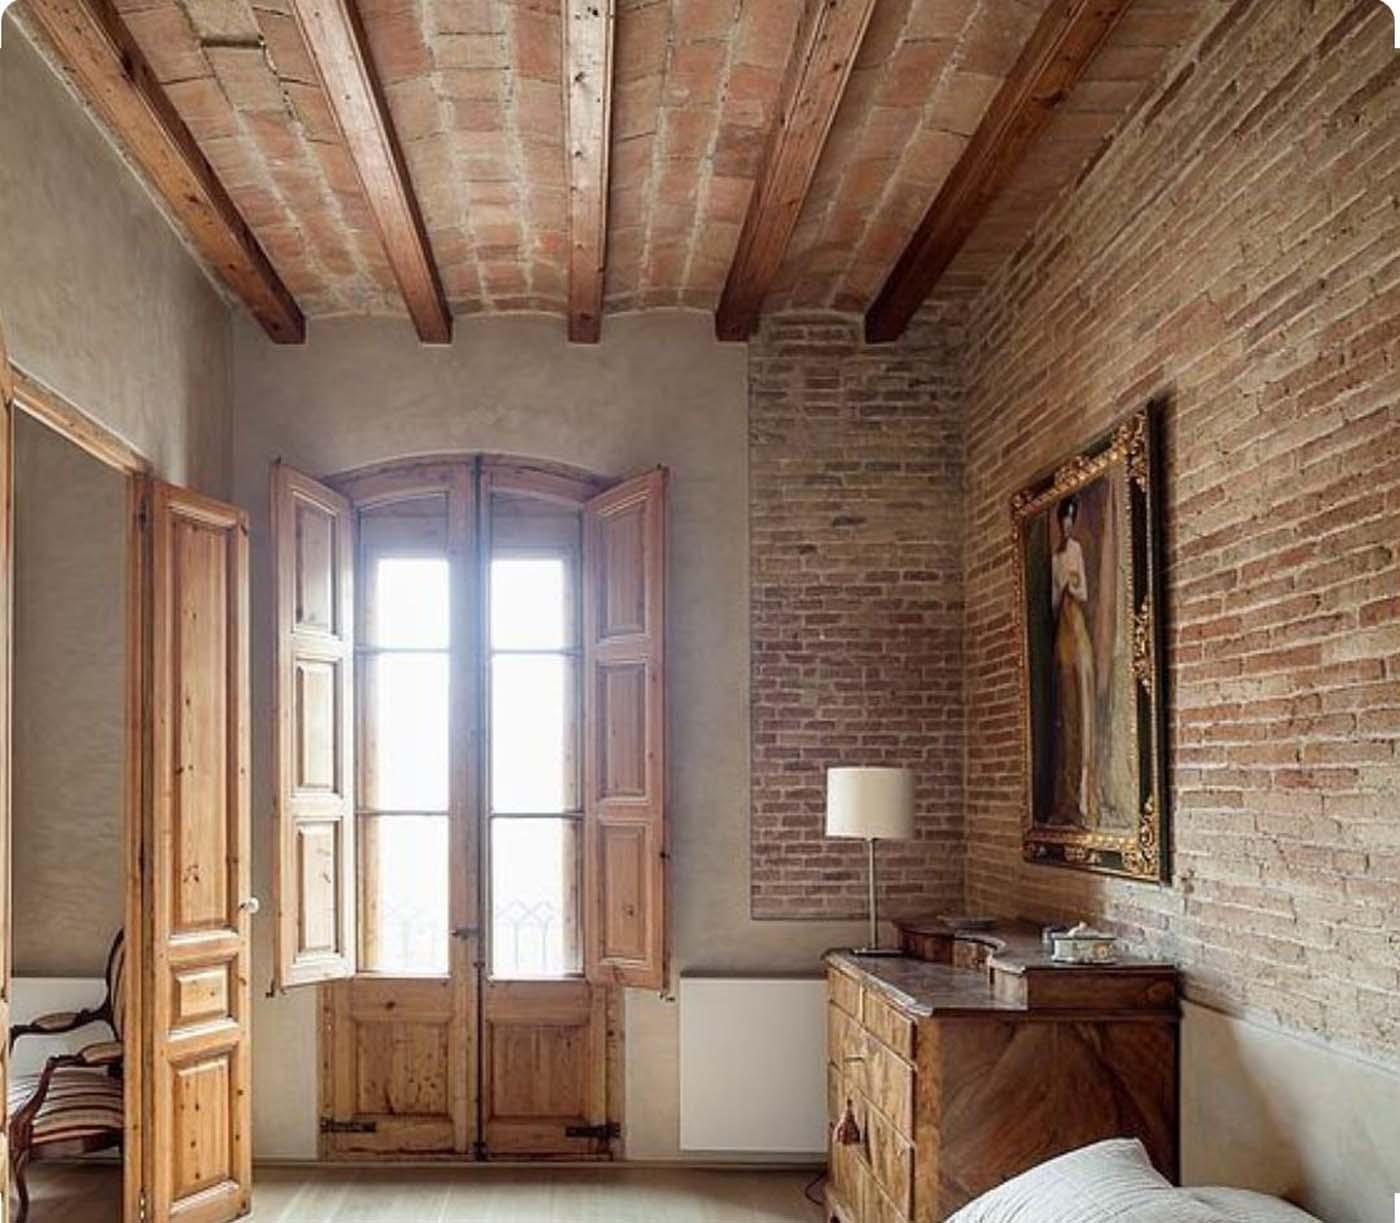 Interior with Arabic brick